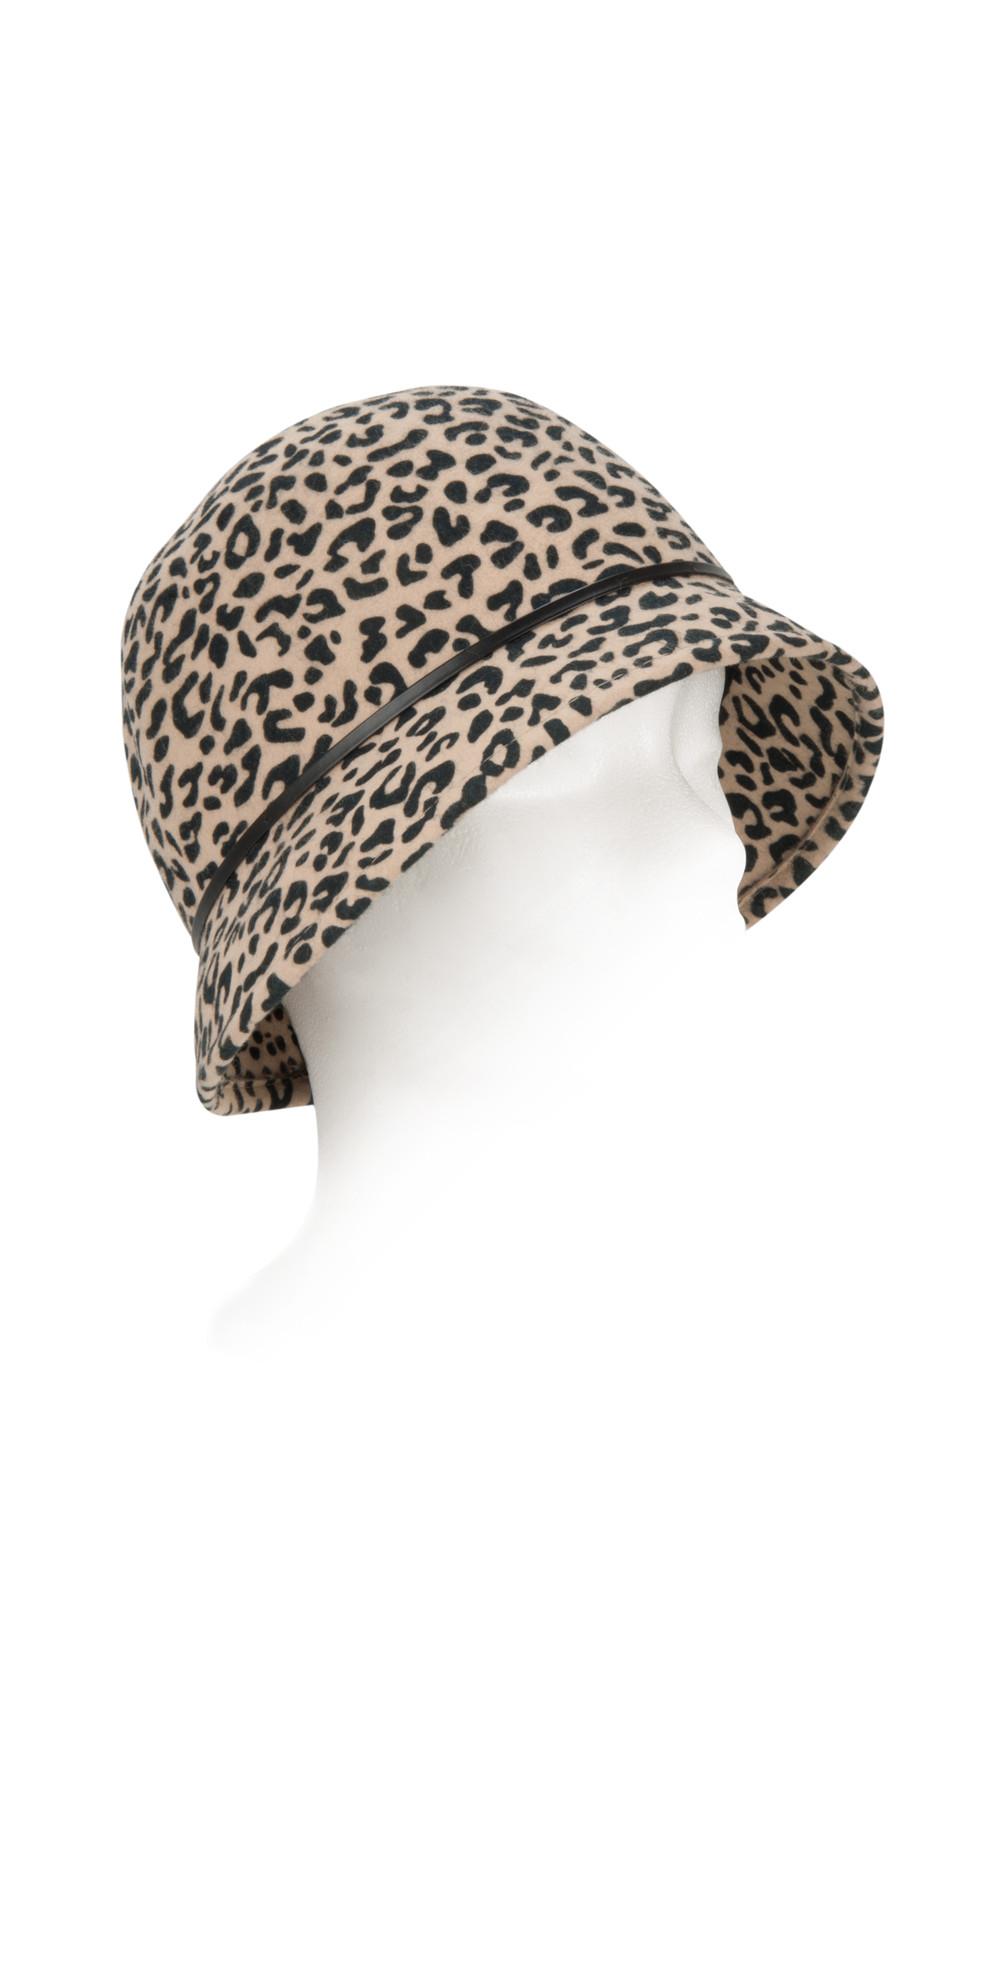 4d743589c7d Pia Rossini Sabrina Leopard Print Cloche Hat in Leopard